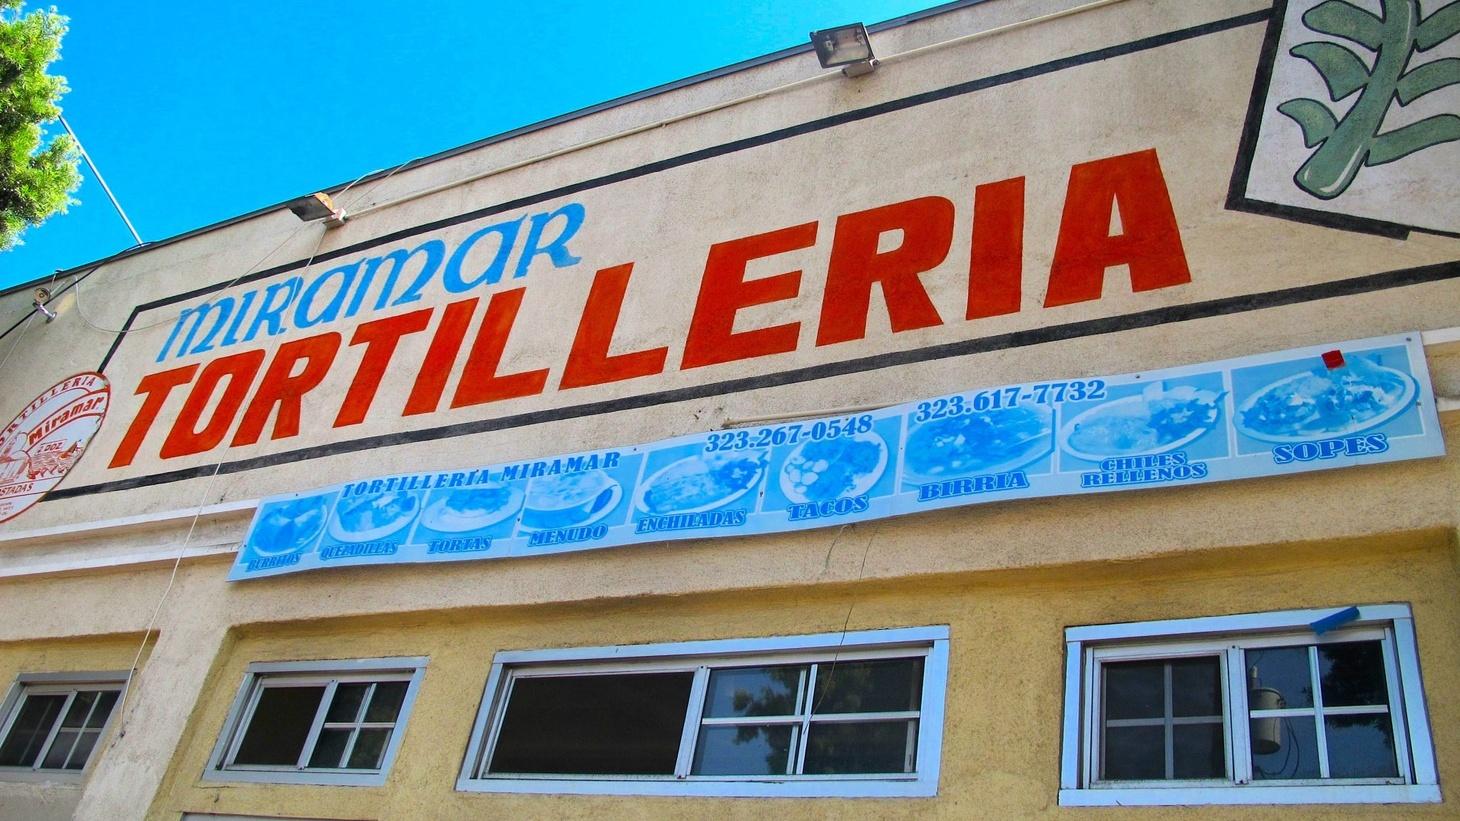 #TortillaTournament week 1 recap: Upsets galore!